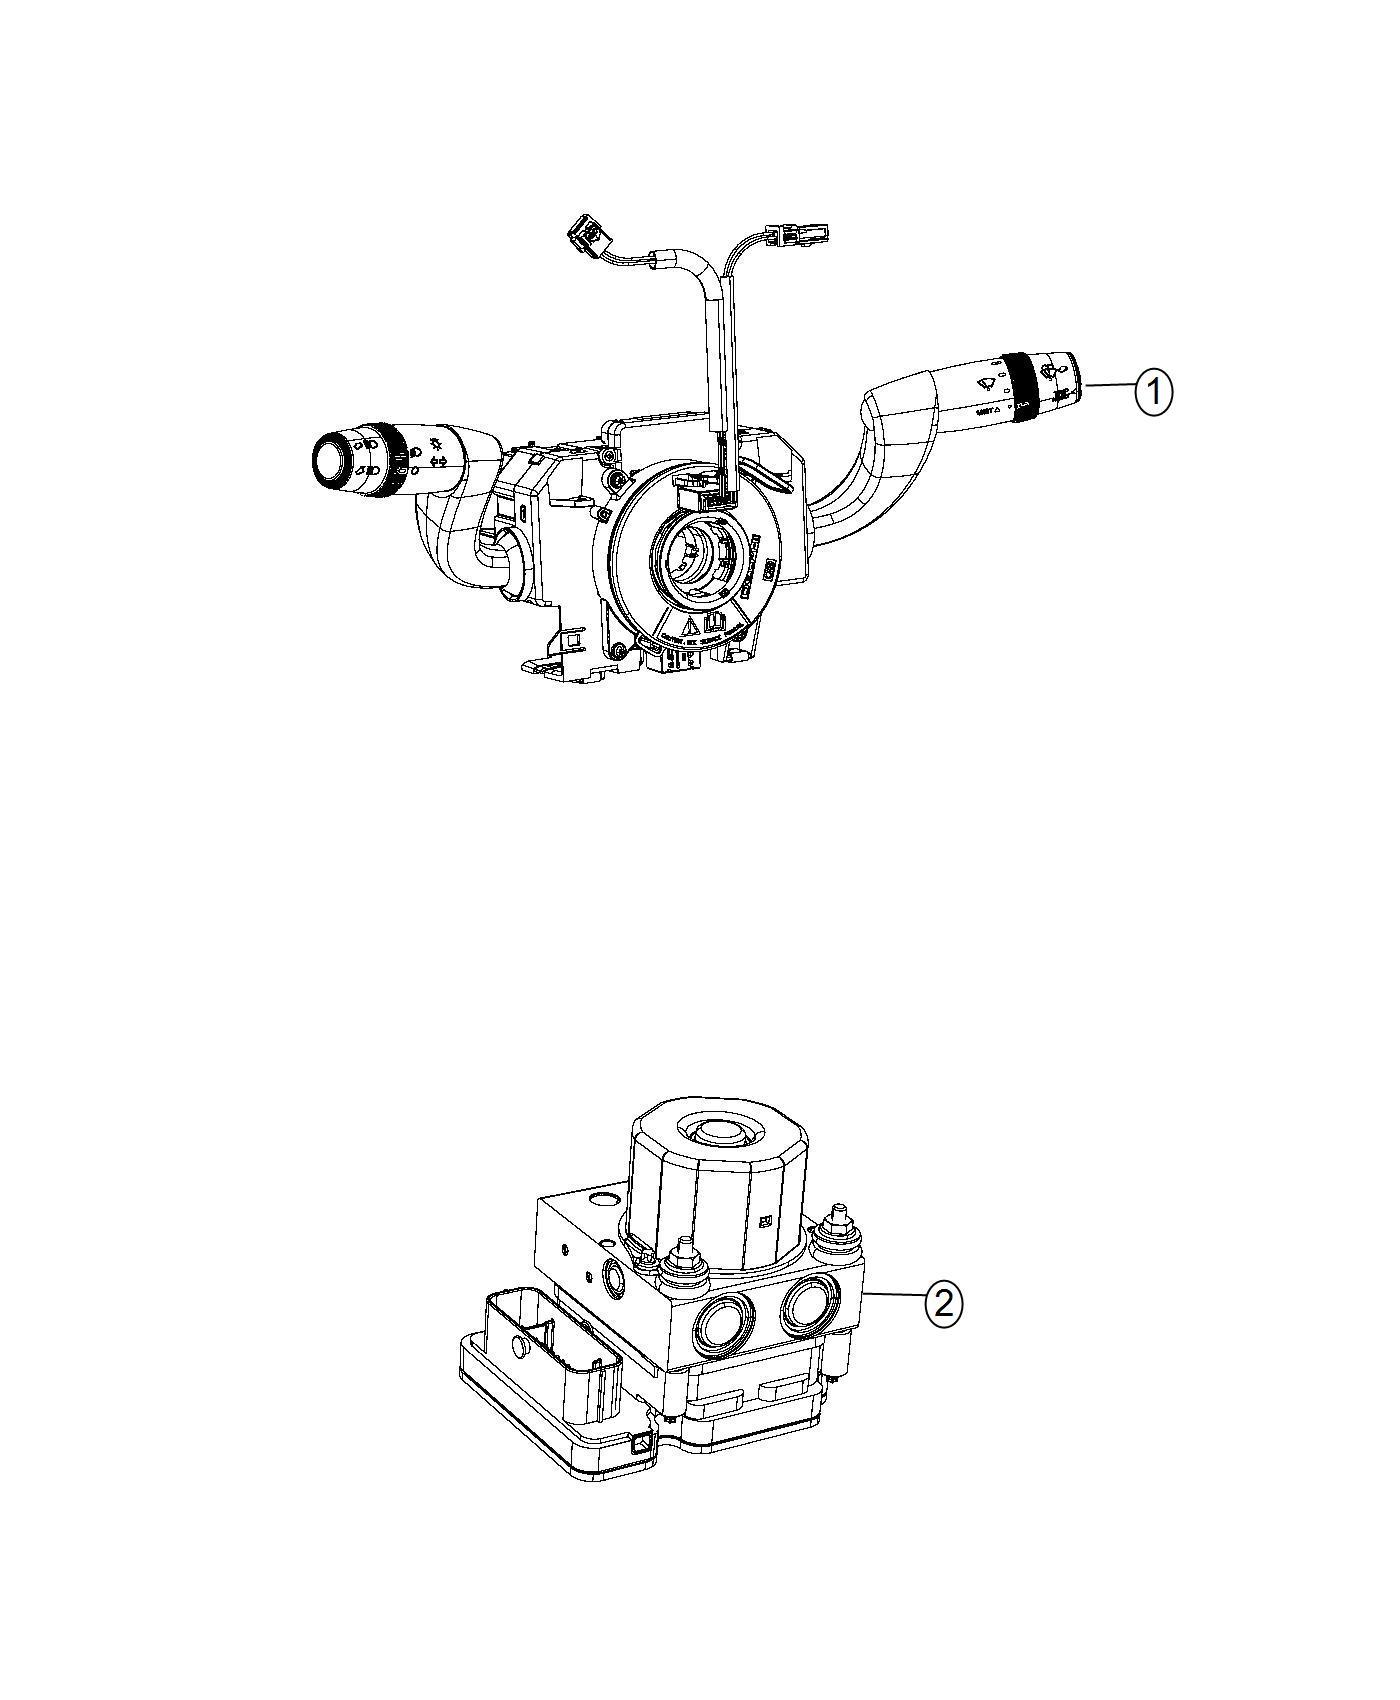 2014 RAM PROMASTER Hydraulic control unit. Anti-lock brake